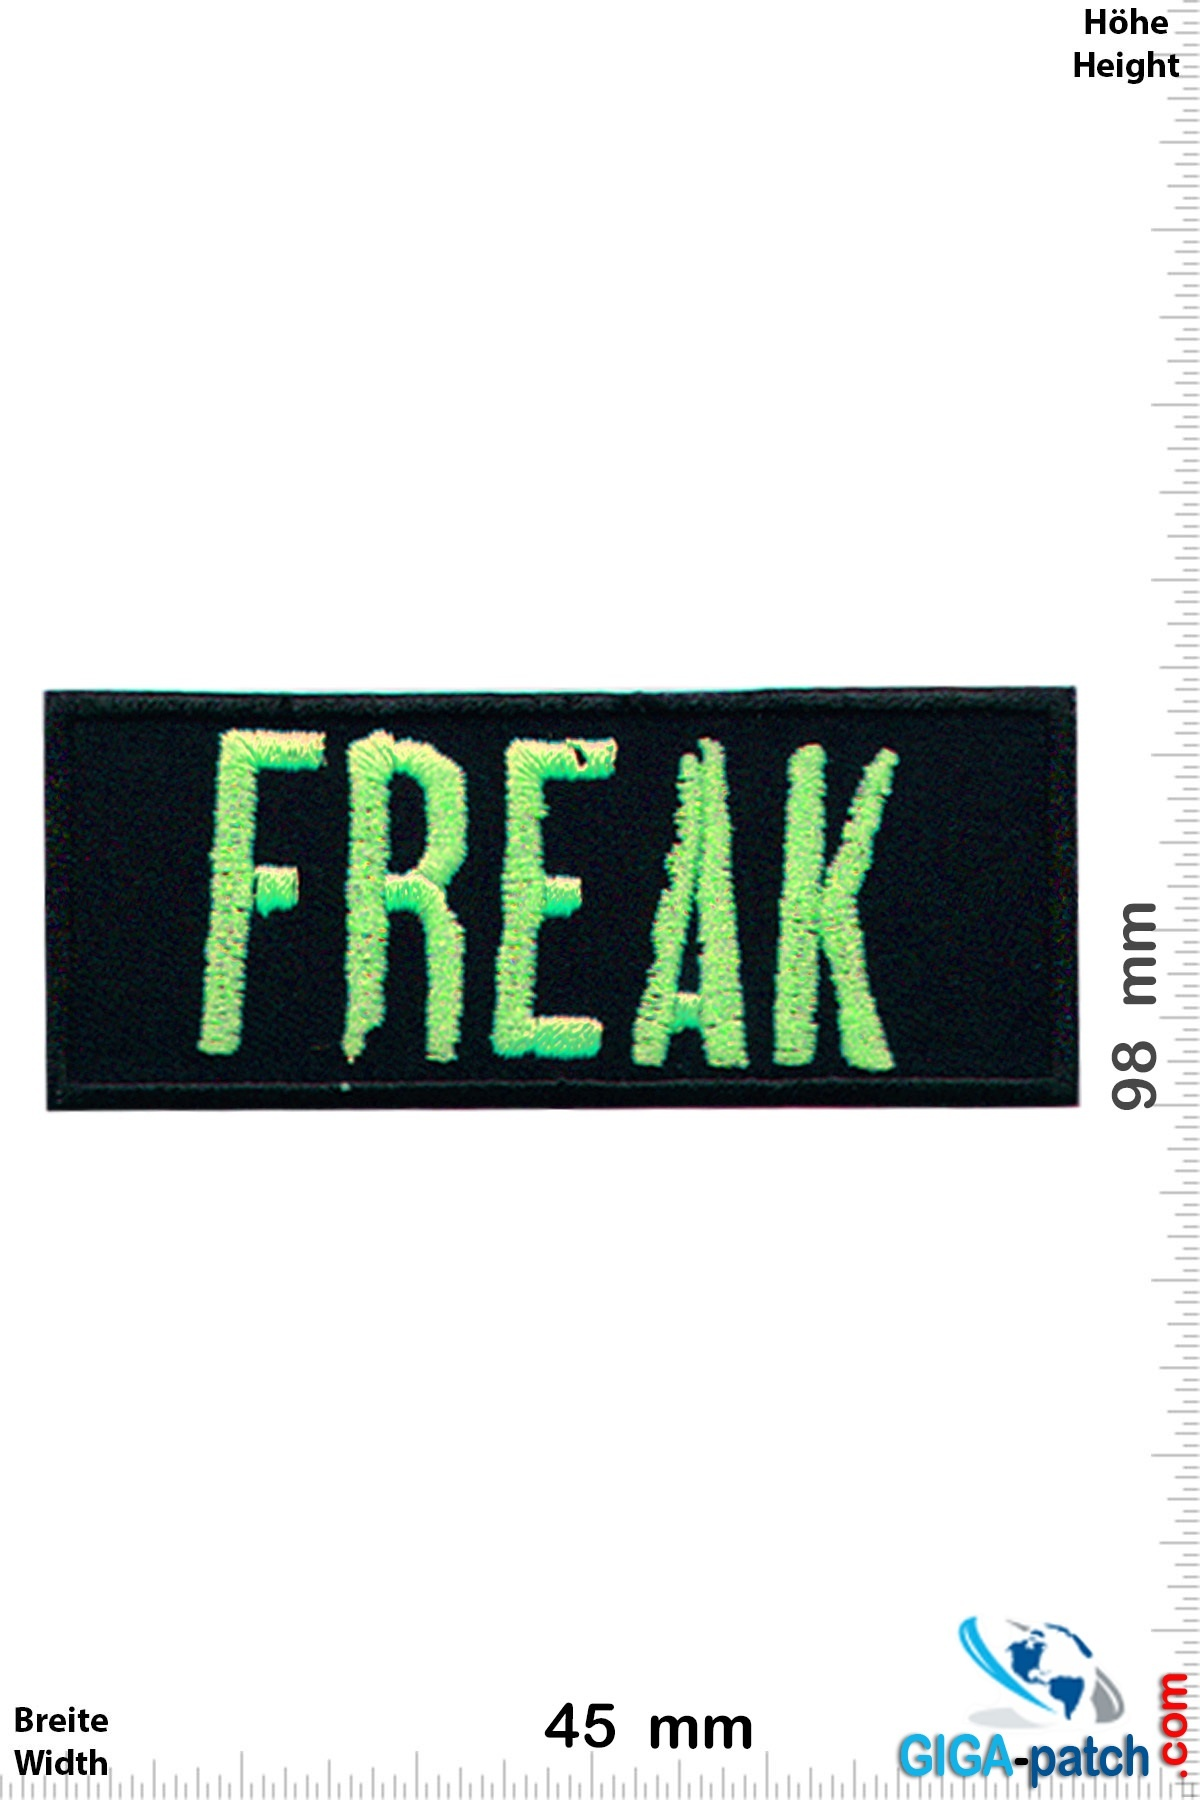 Freak  - S.O.P.H.I.E. - Sophie Lancaster Foundation